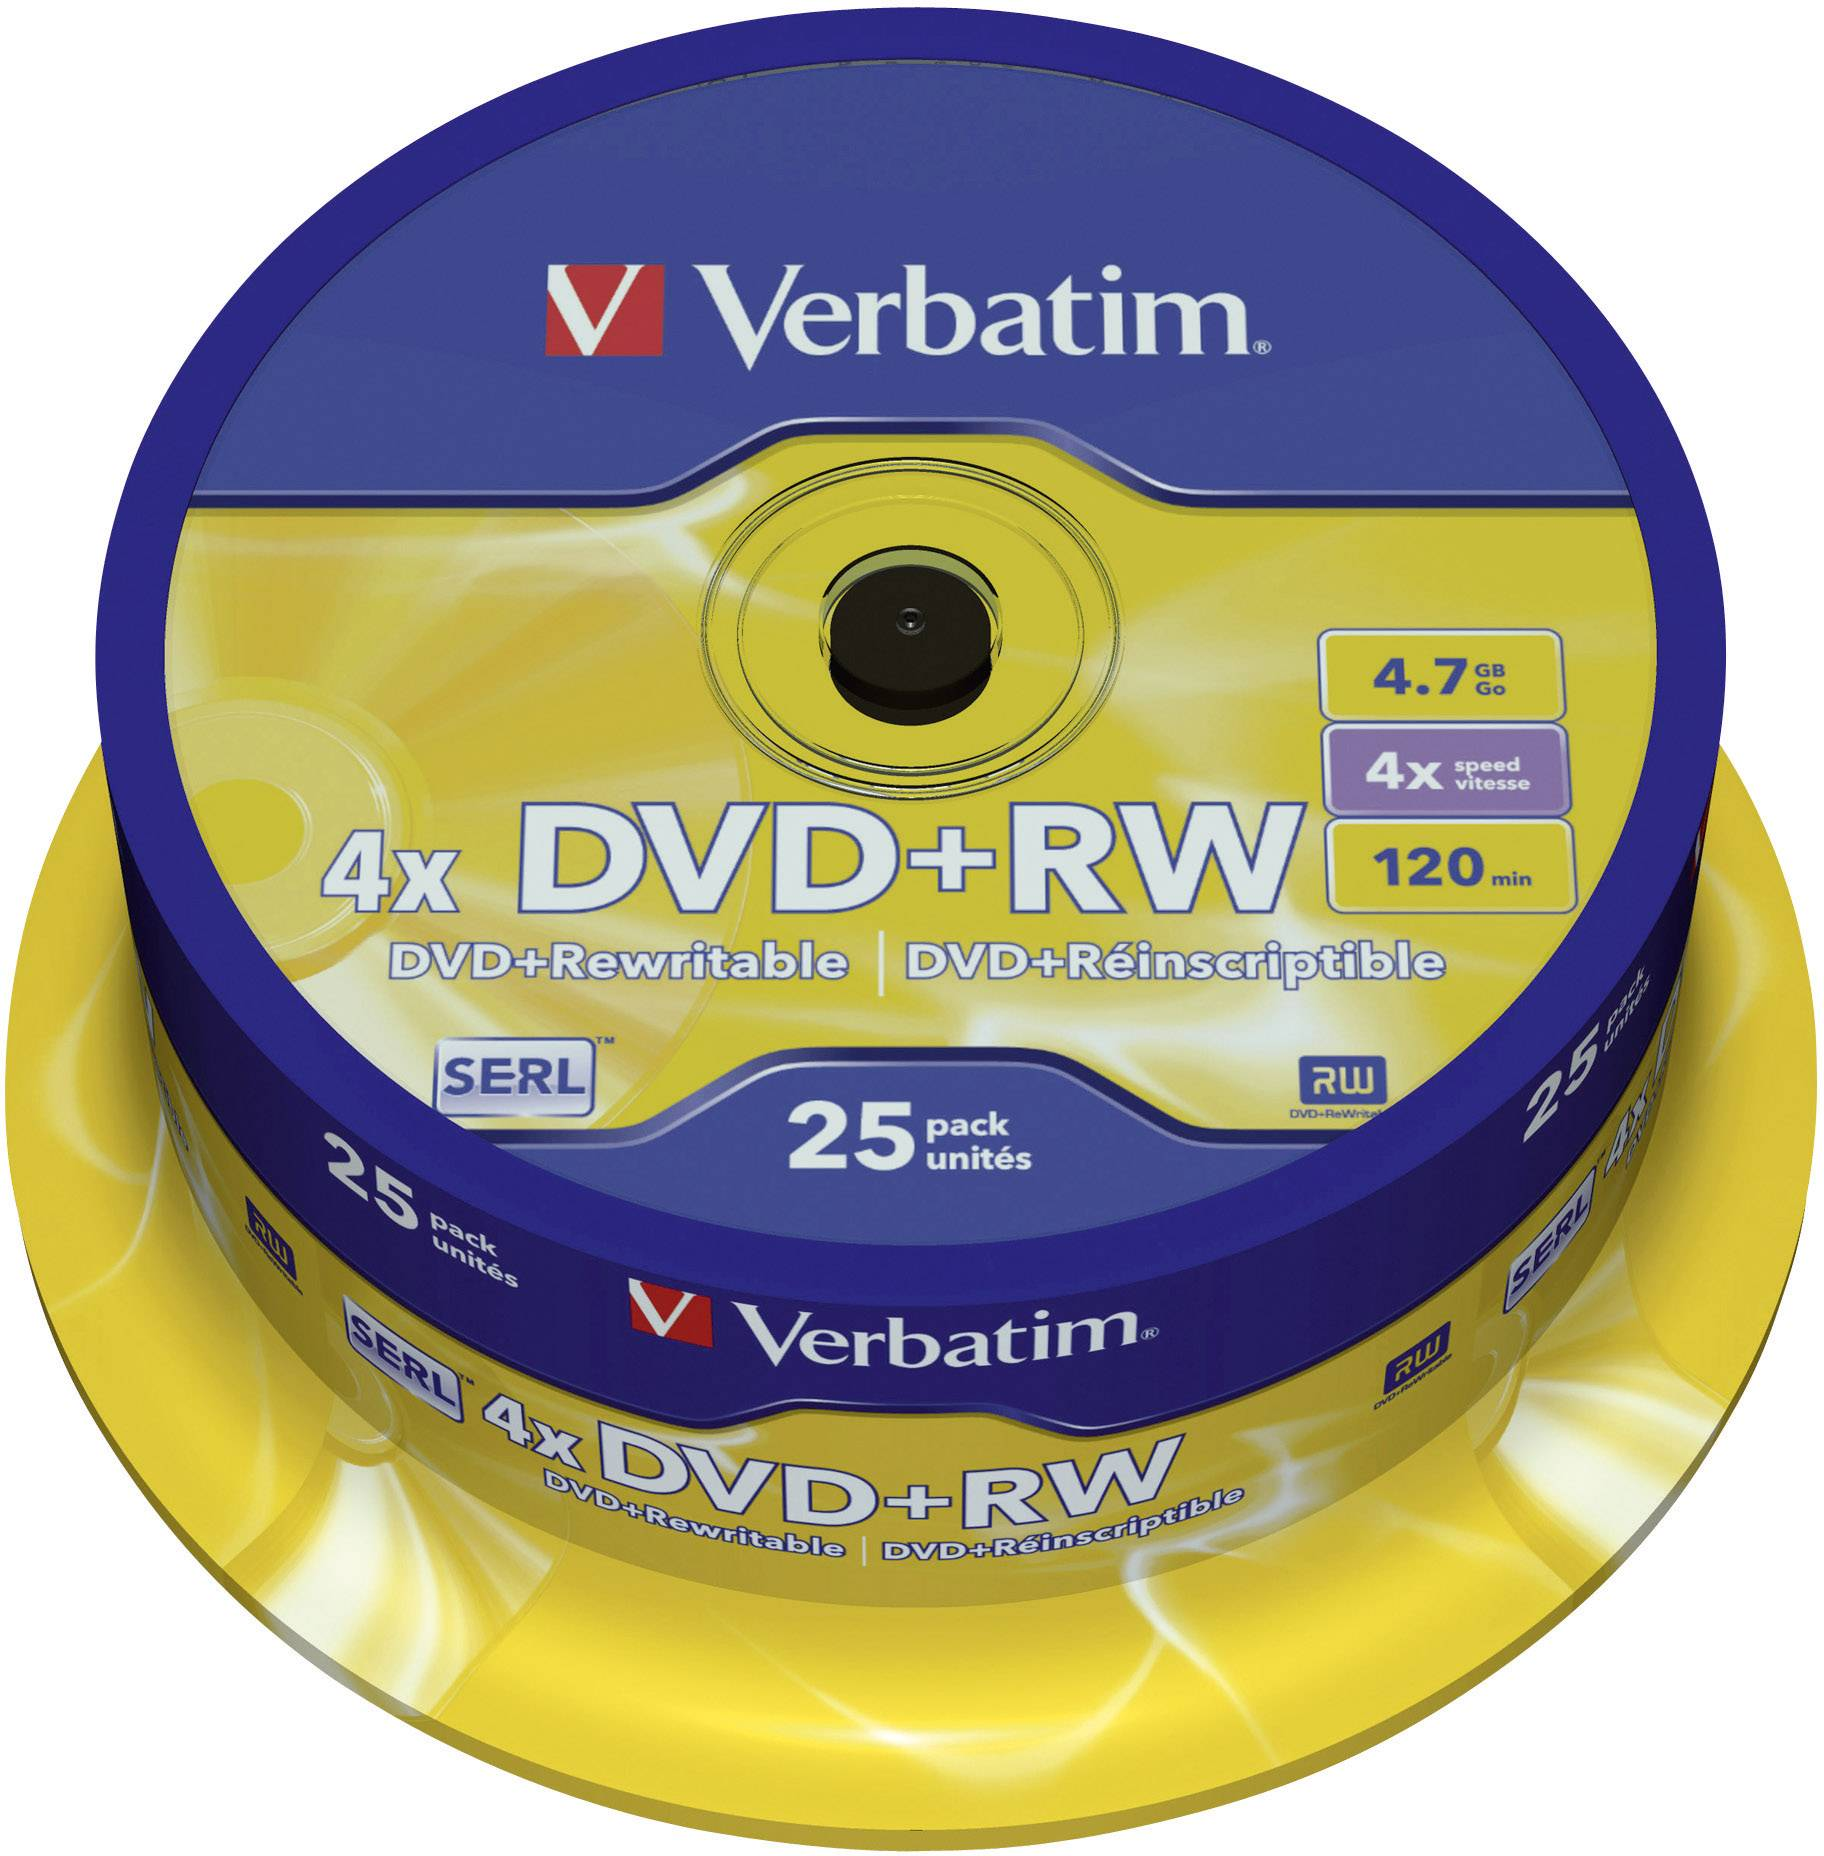 DVD+RW 4.7 GB Verbatim 43489, přepisovatelné, 25 ks, vřeteno